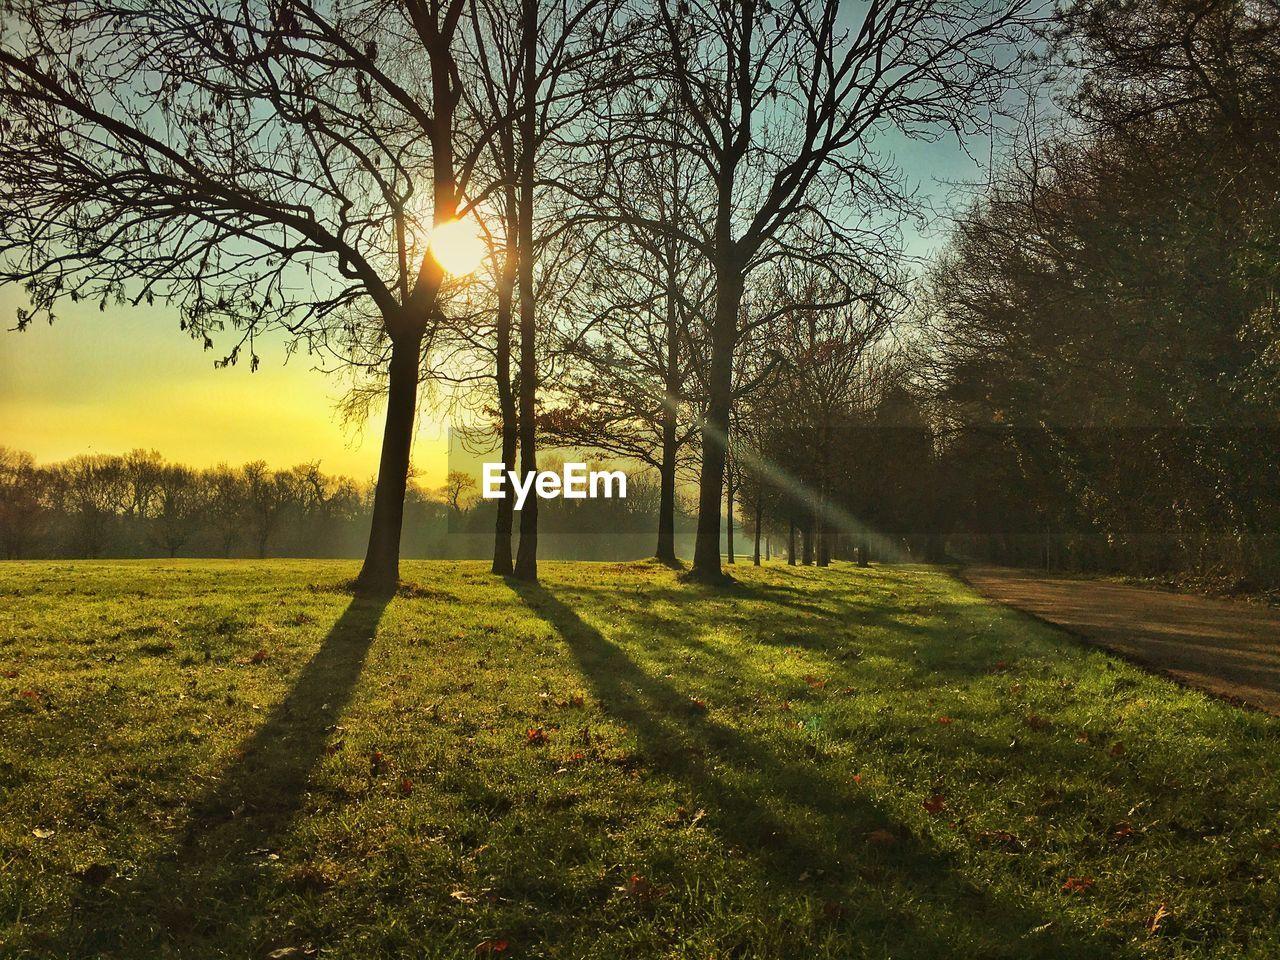 tree, plant, sky, scenics - nature, tranquility, beauty in nature, grass, tranquil scene, sun, nature, sunlight, land, field, no people, non-urban scene, landscape, environment, sunset, sunbeam, idyllic, lens flare, outdoors, streaming